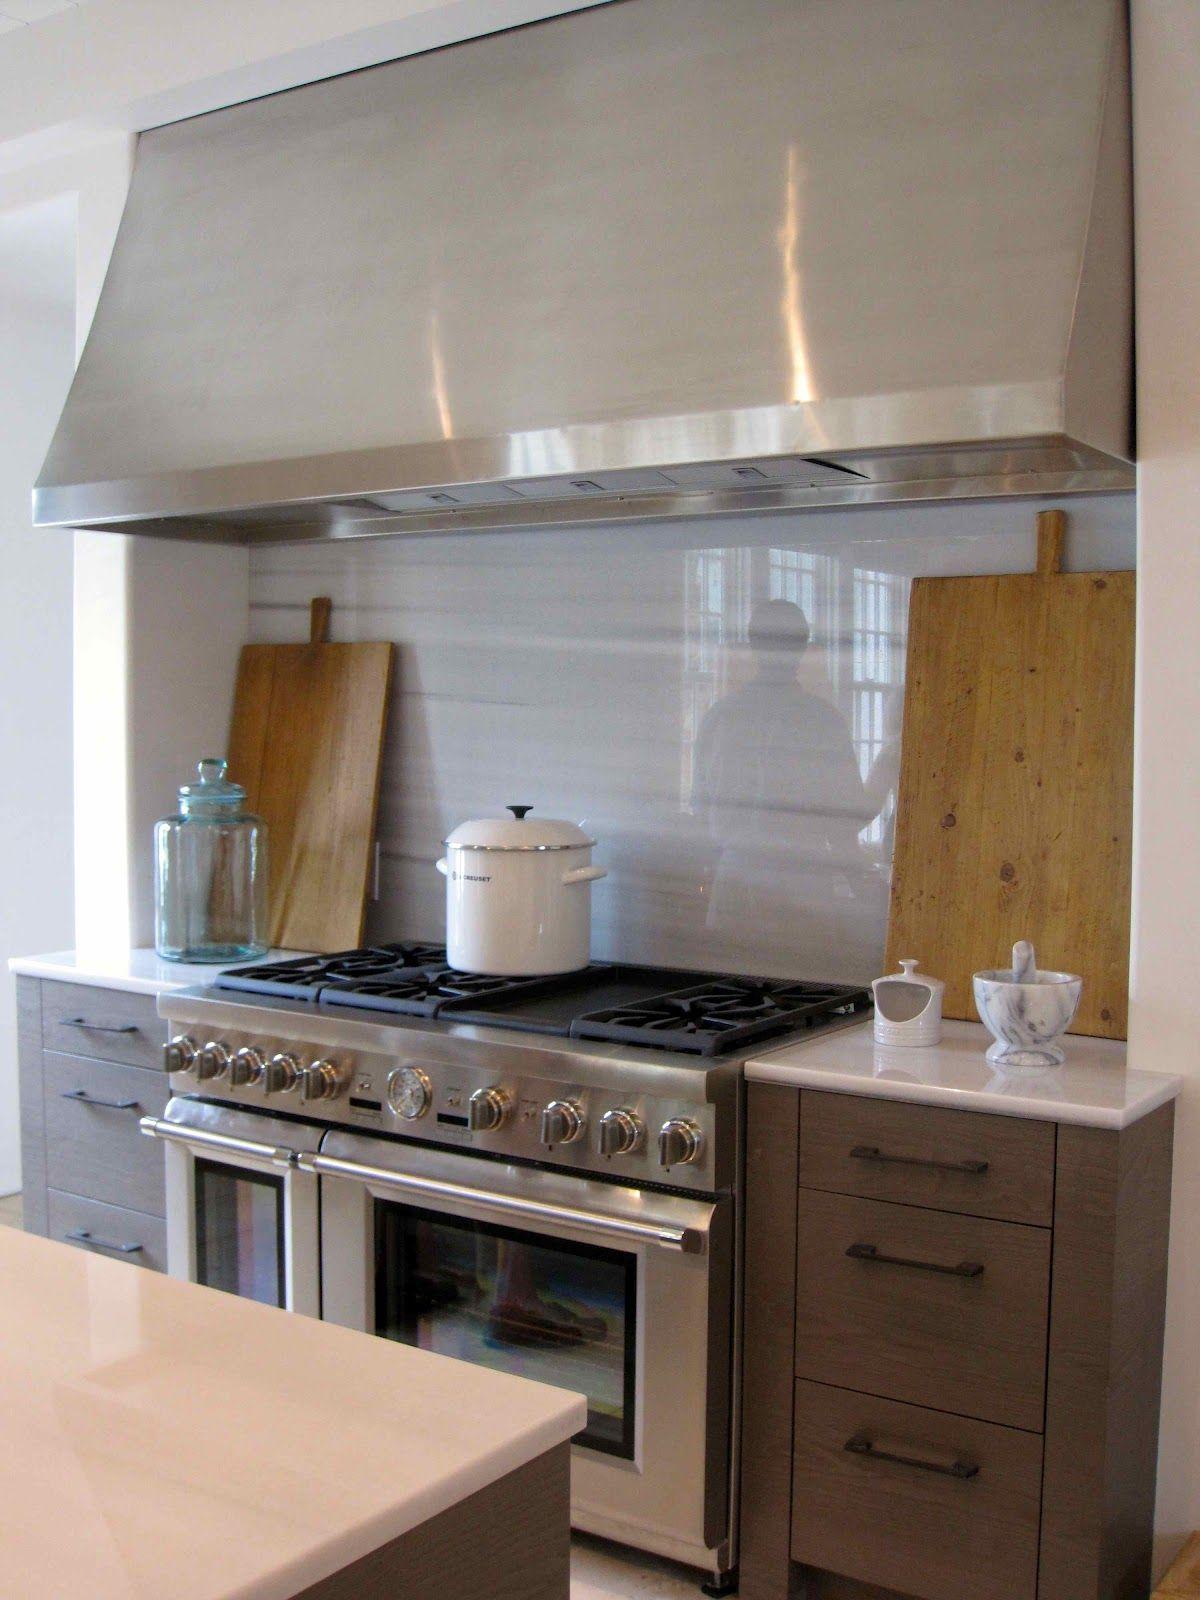 Coastal living beach house kitchen google search art pinterest